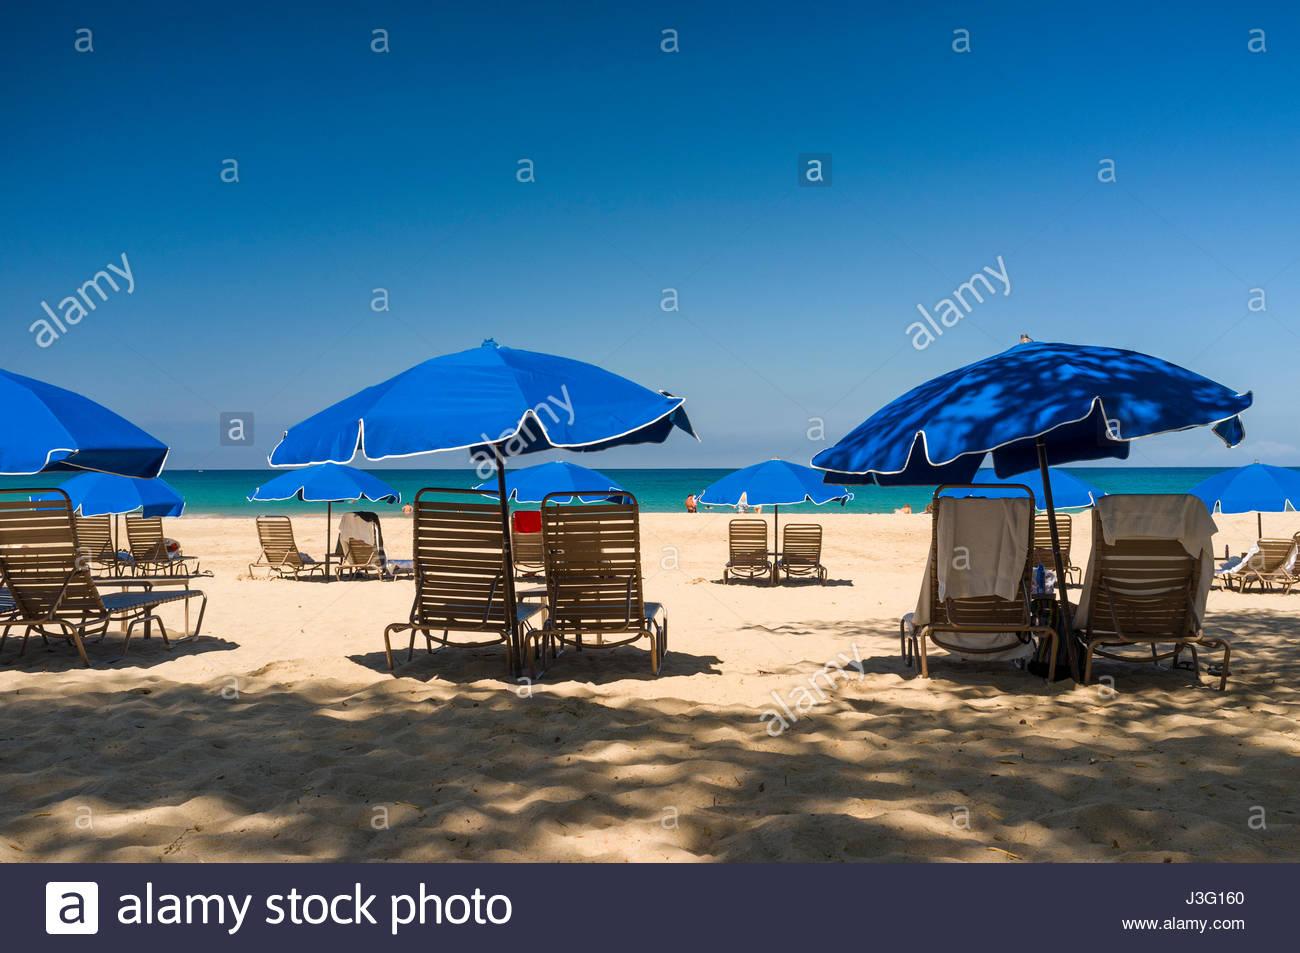 lounge chairs under blue umbrellas, Hapuna Beach Prince Hotel, South Kohala, Hawaii, USA - Stock Image